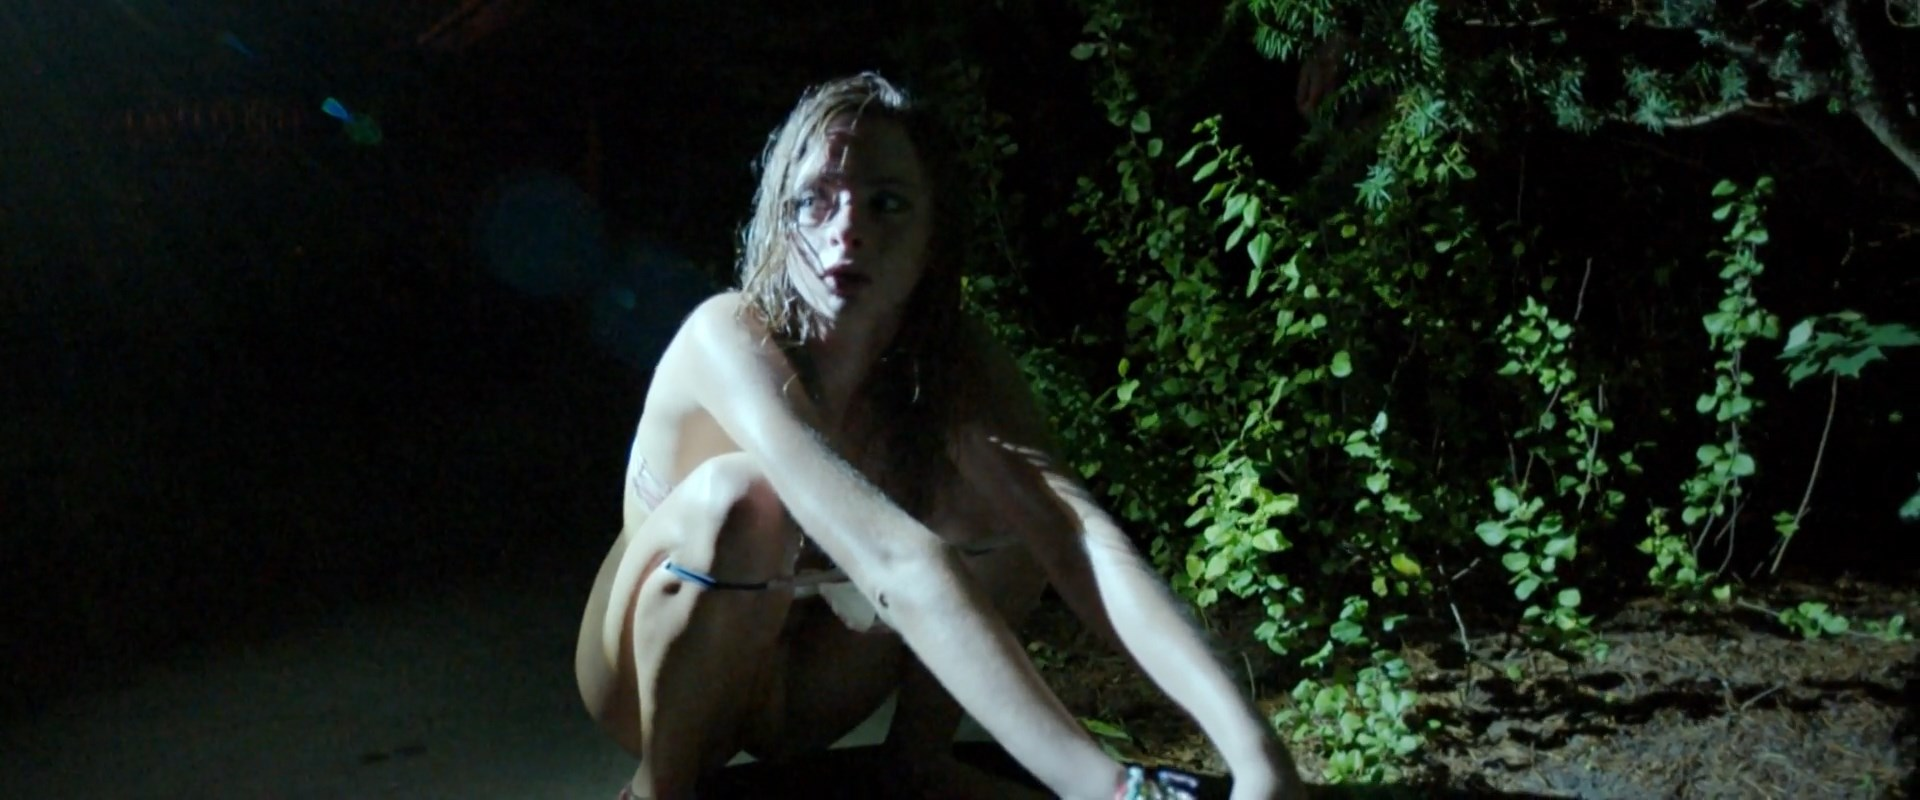 Nude Sina Tkotsch nudes (34 photo), Tits, Hot, Boobs, cameltoe 2017